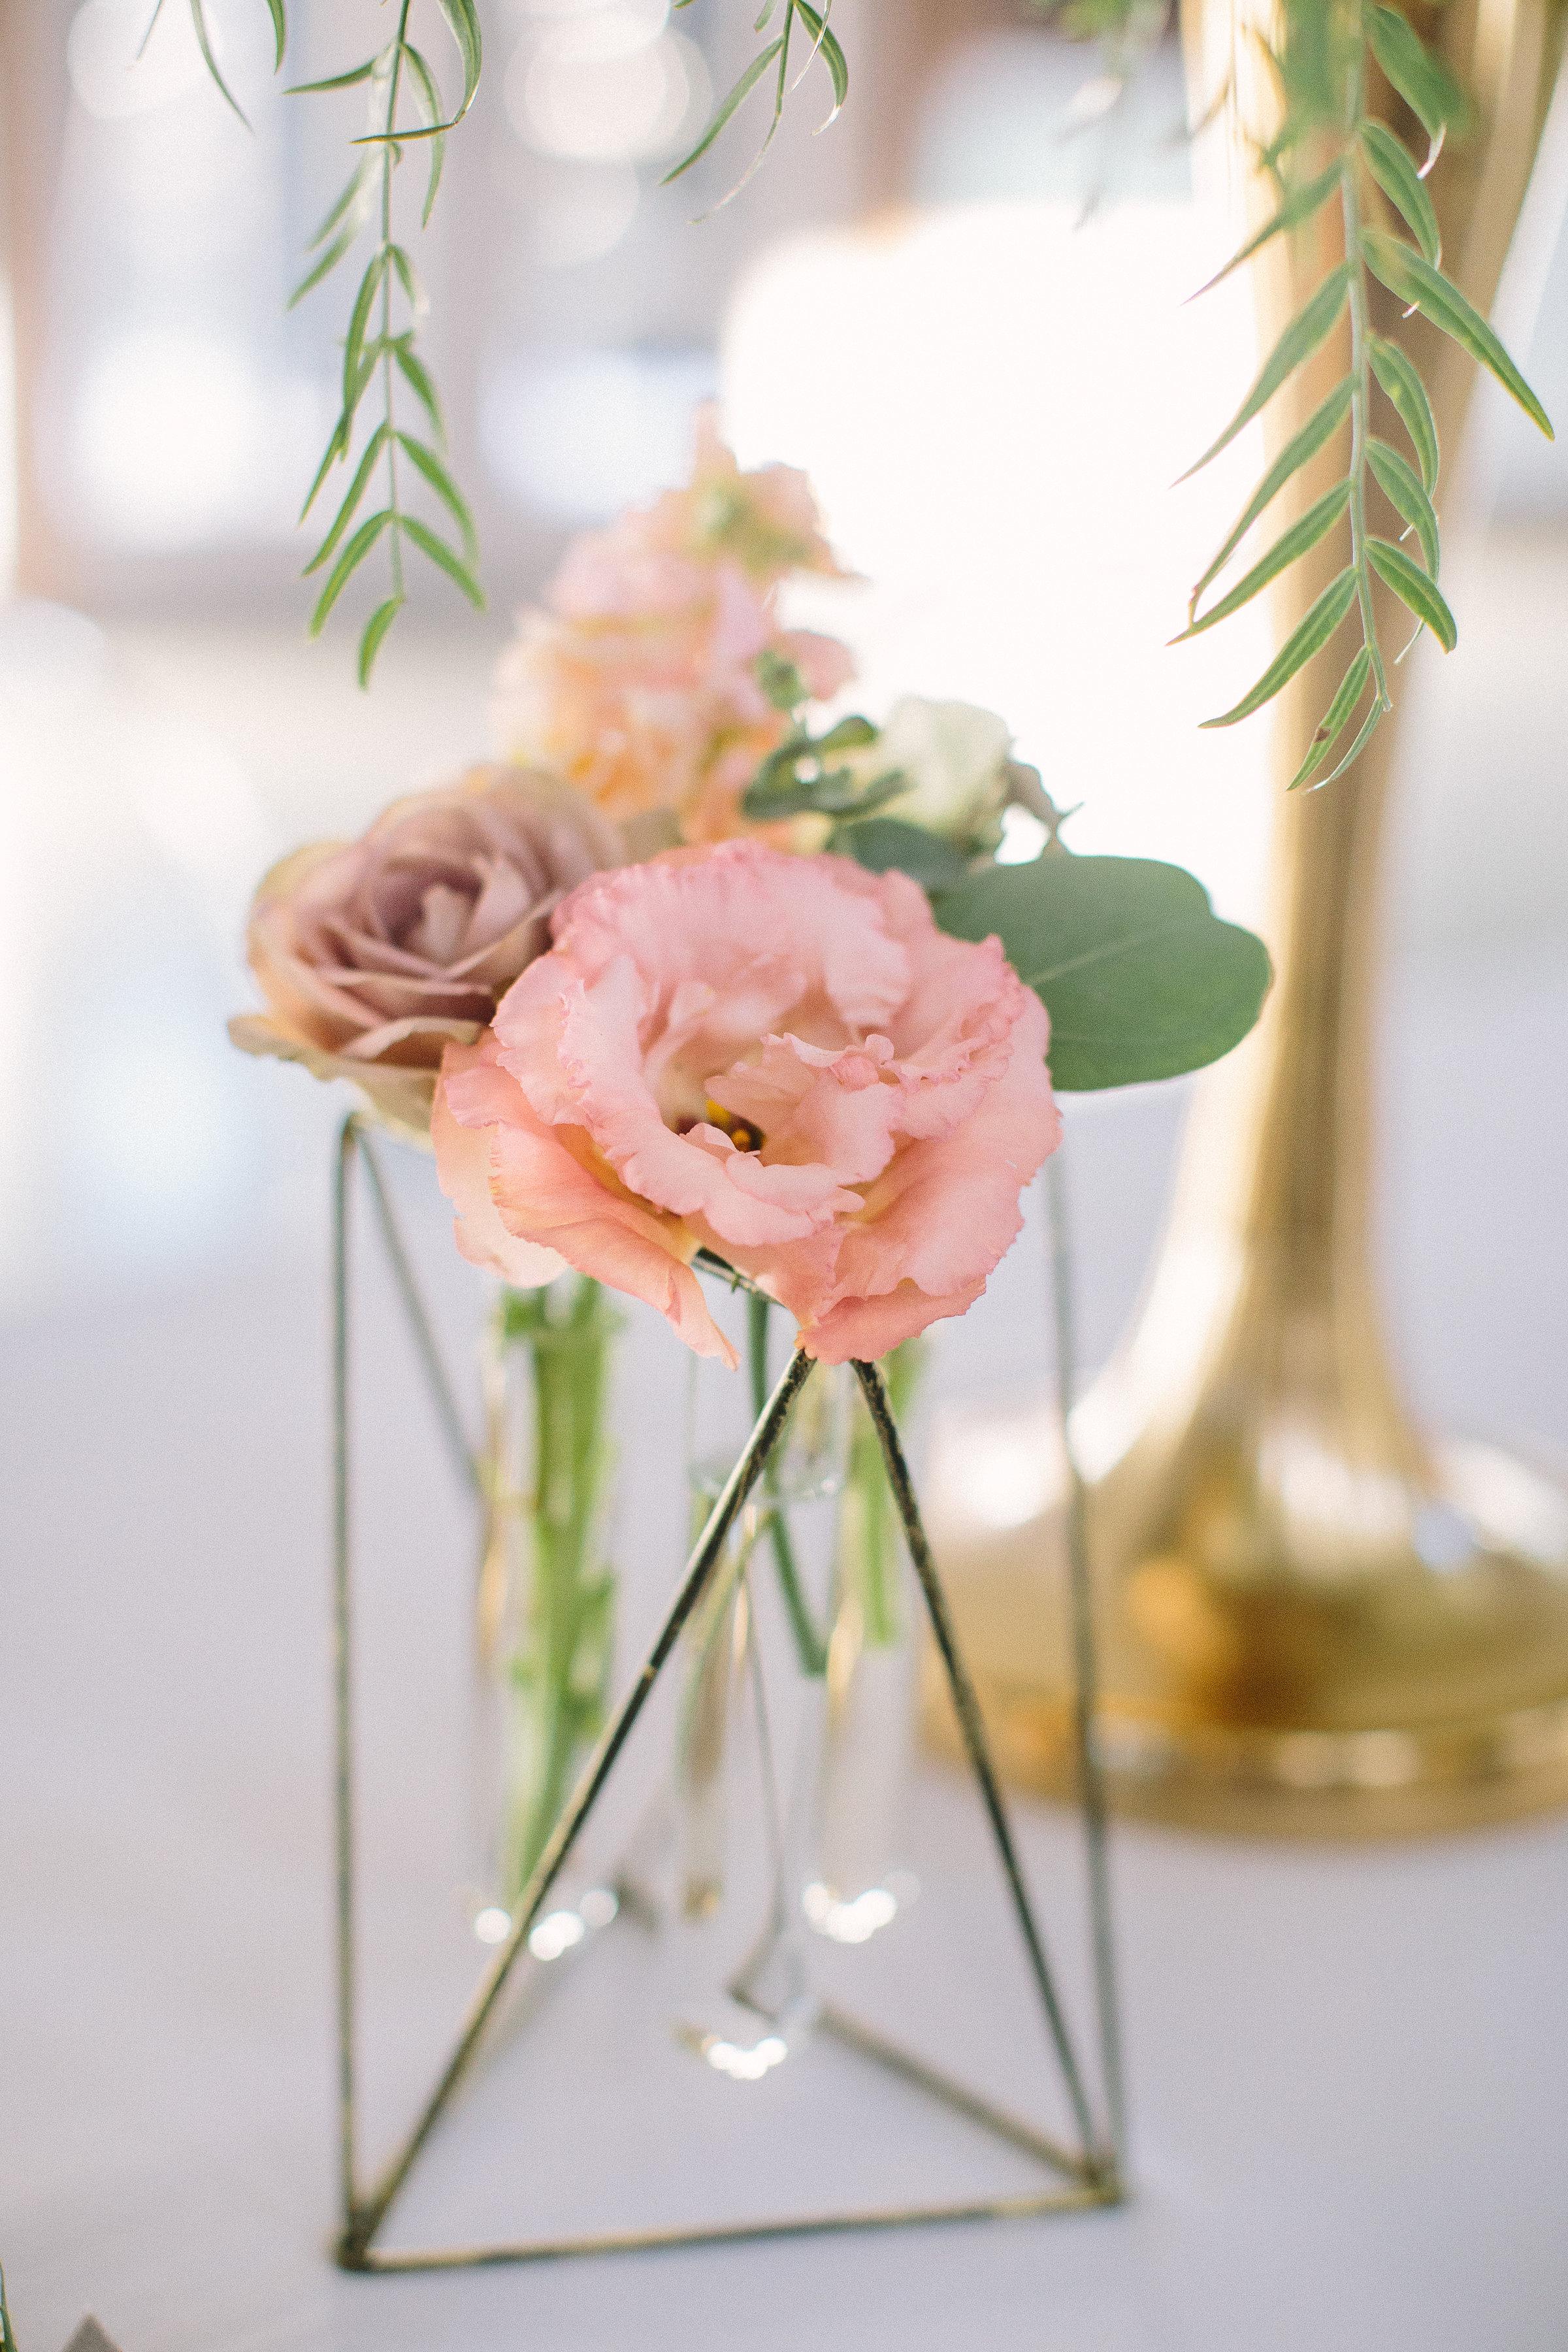 Ellen-Ashton-Photography-Peach-Creek-Ranch-Weddings-Wed-and-Prosper163